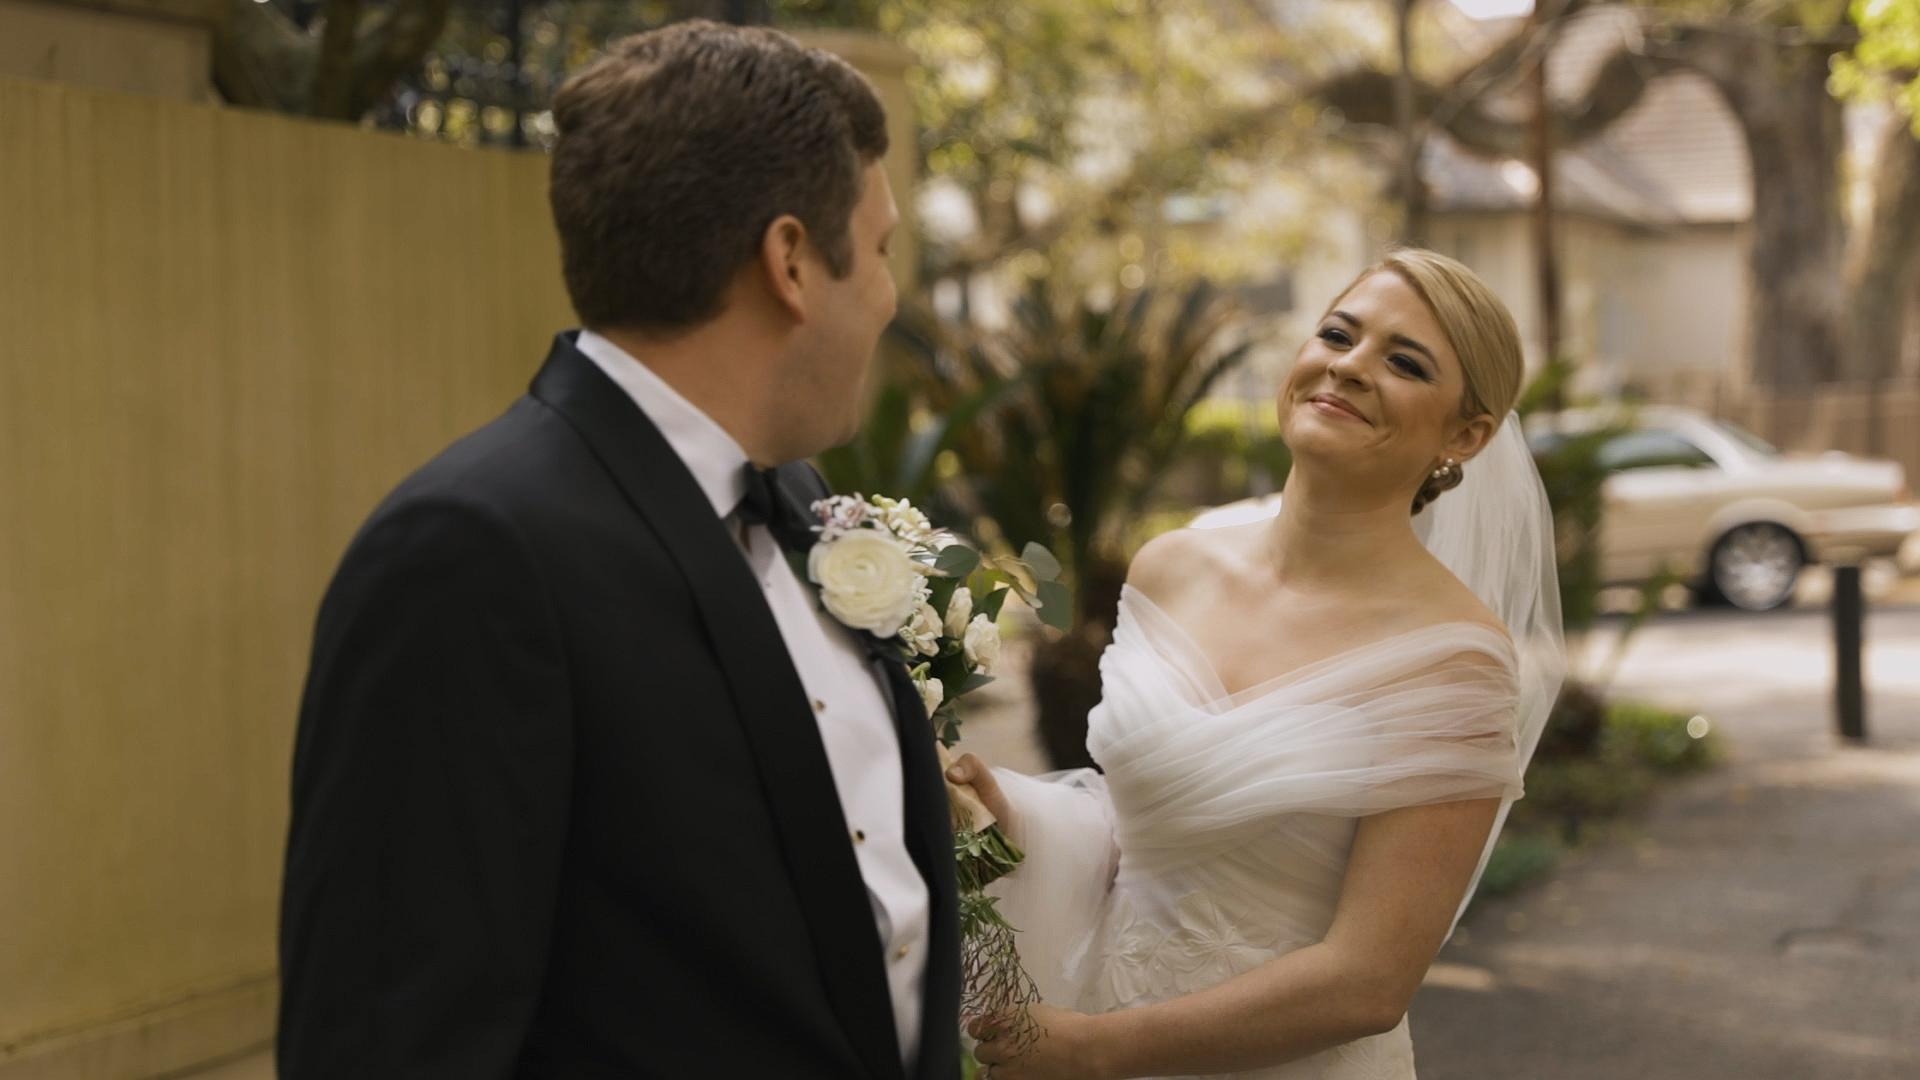 New Orleans Country Club Wedding - Bride Film